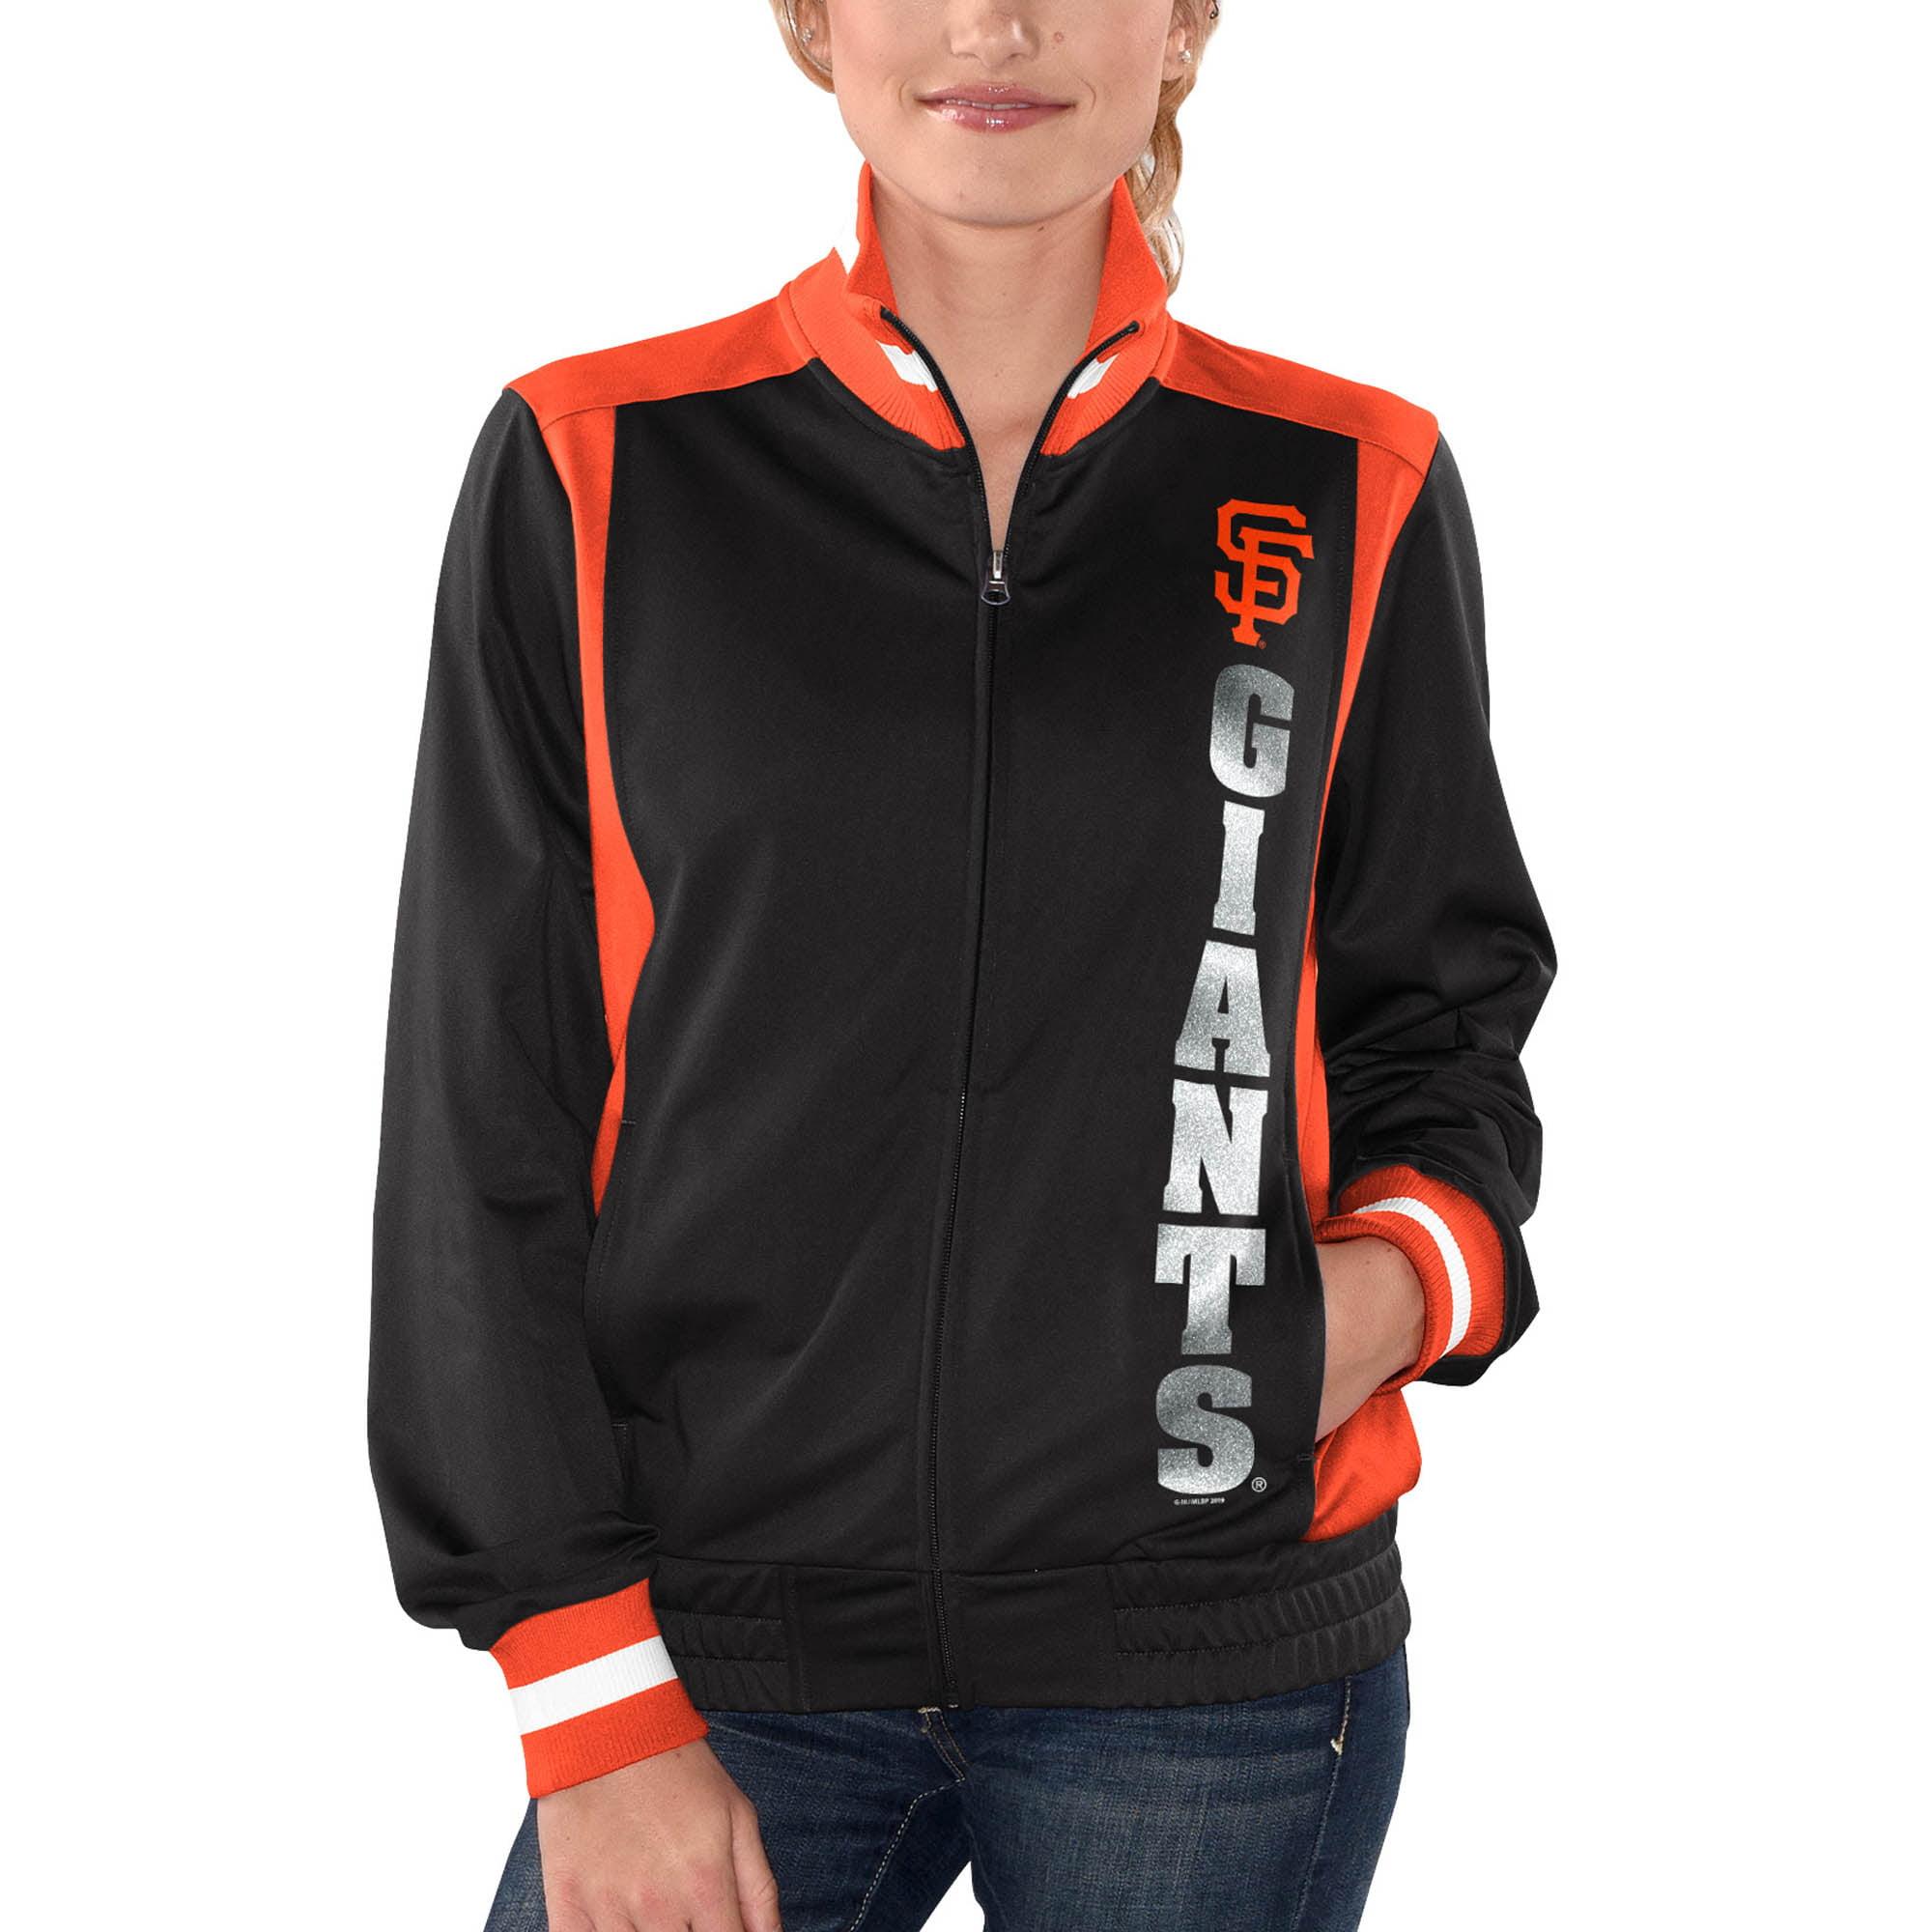 San Francisco Giants G-III 4Her by Carl Banks Women's On Deck Full-Zip Track Jacket - Black